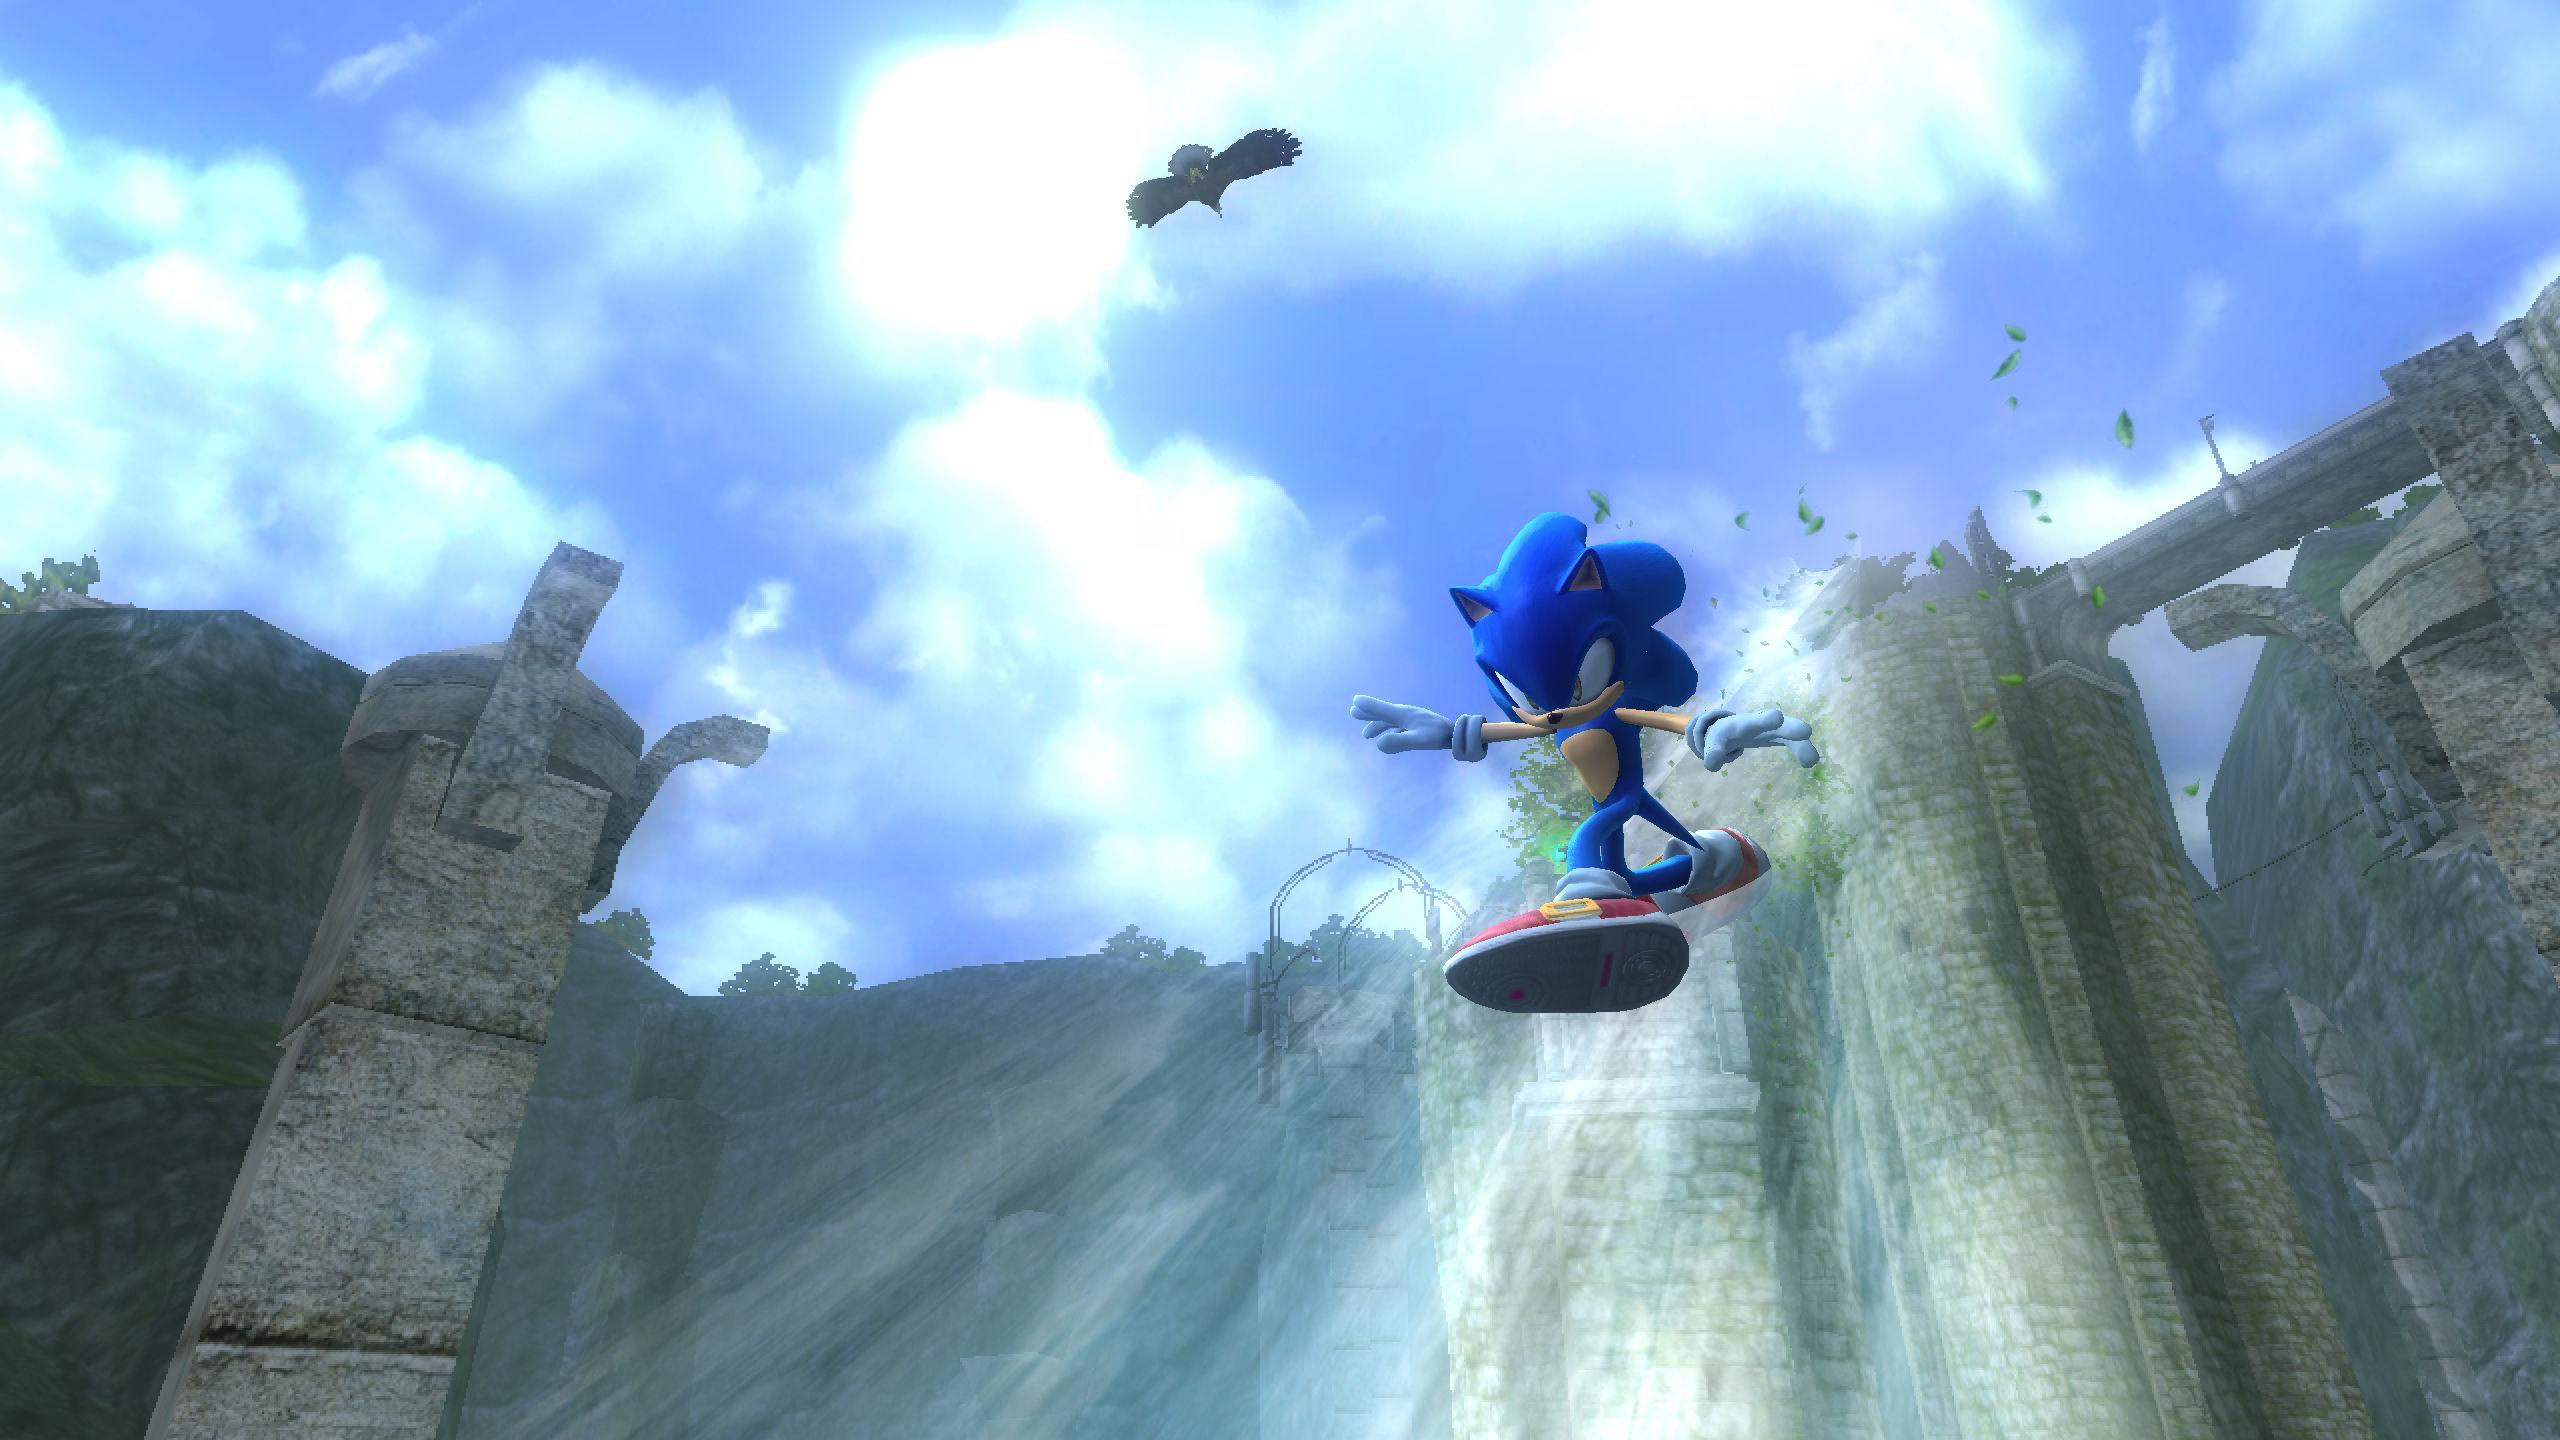 File:Sonic06screen50.jpg